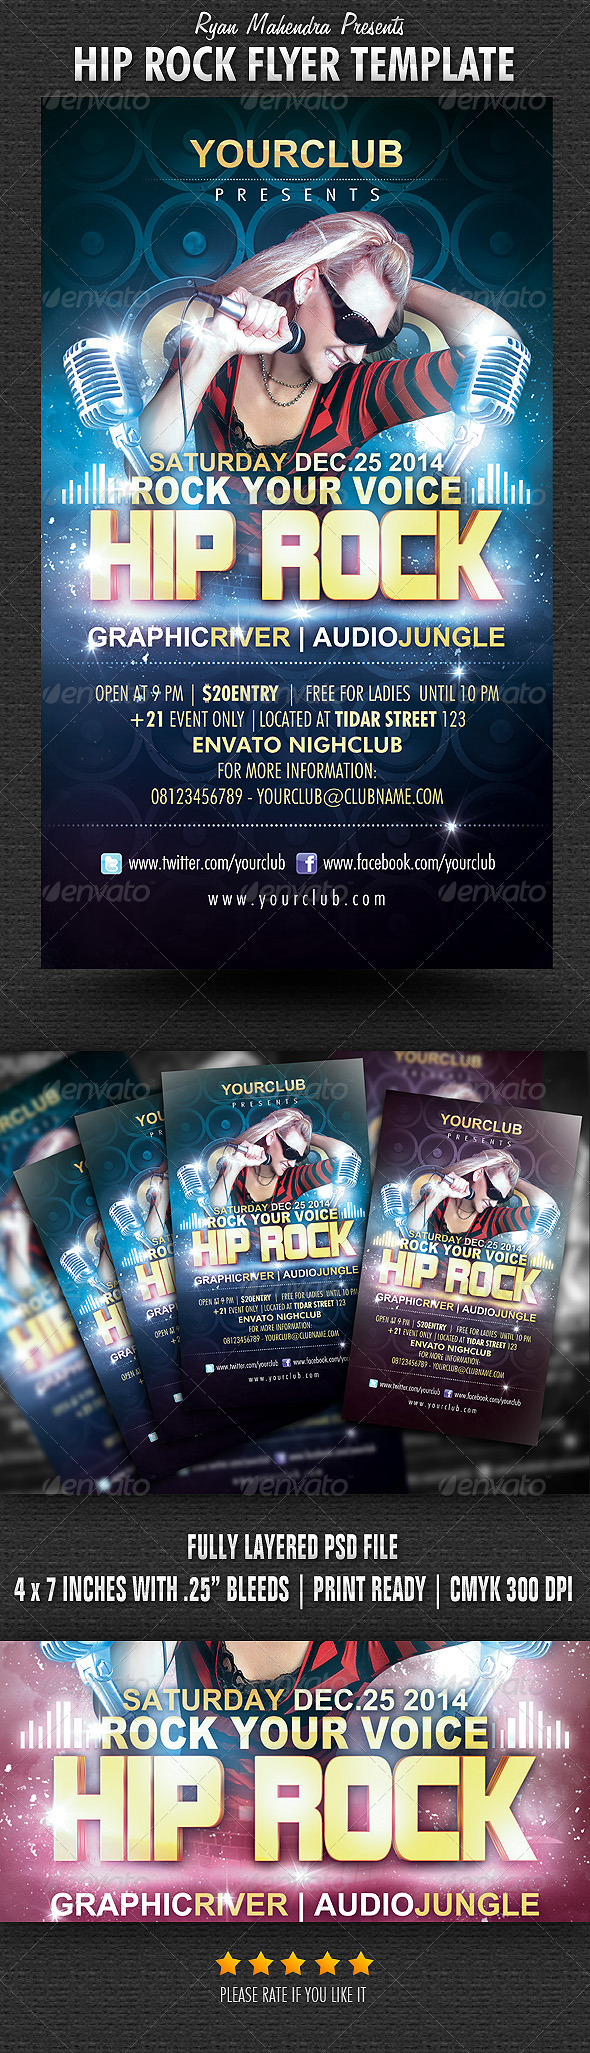 Hip Rock Flyer Template - Flyers Print Templates